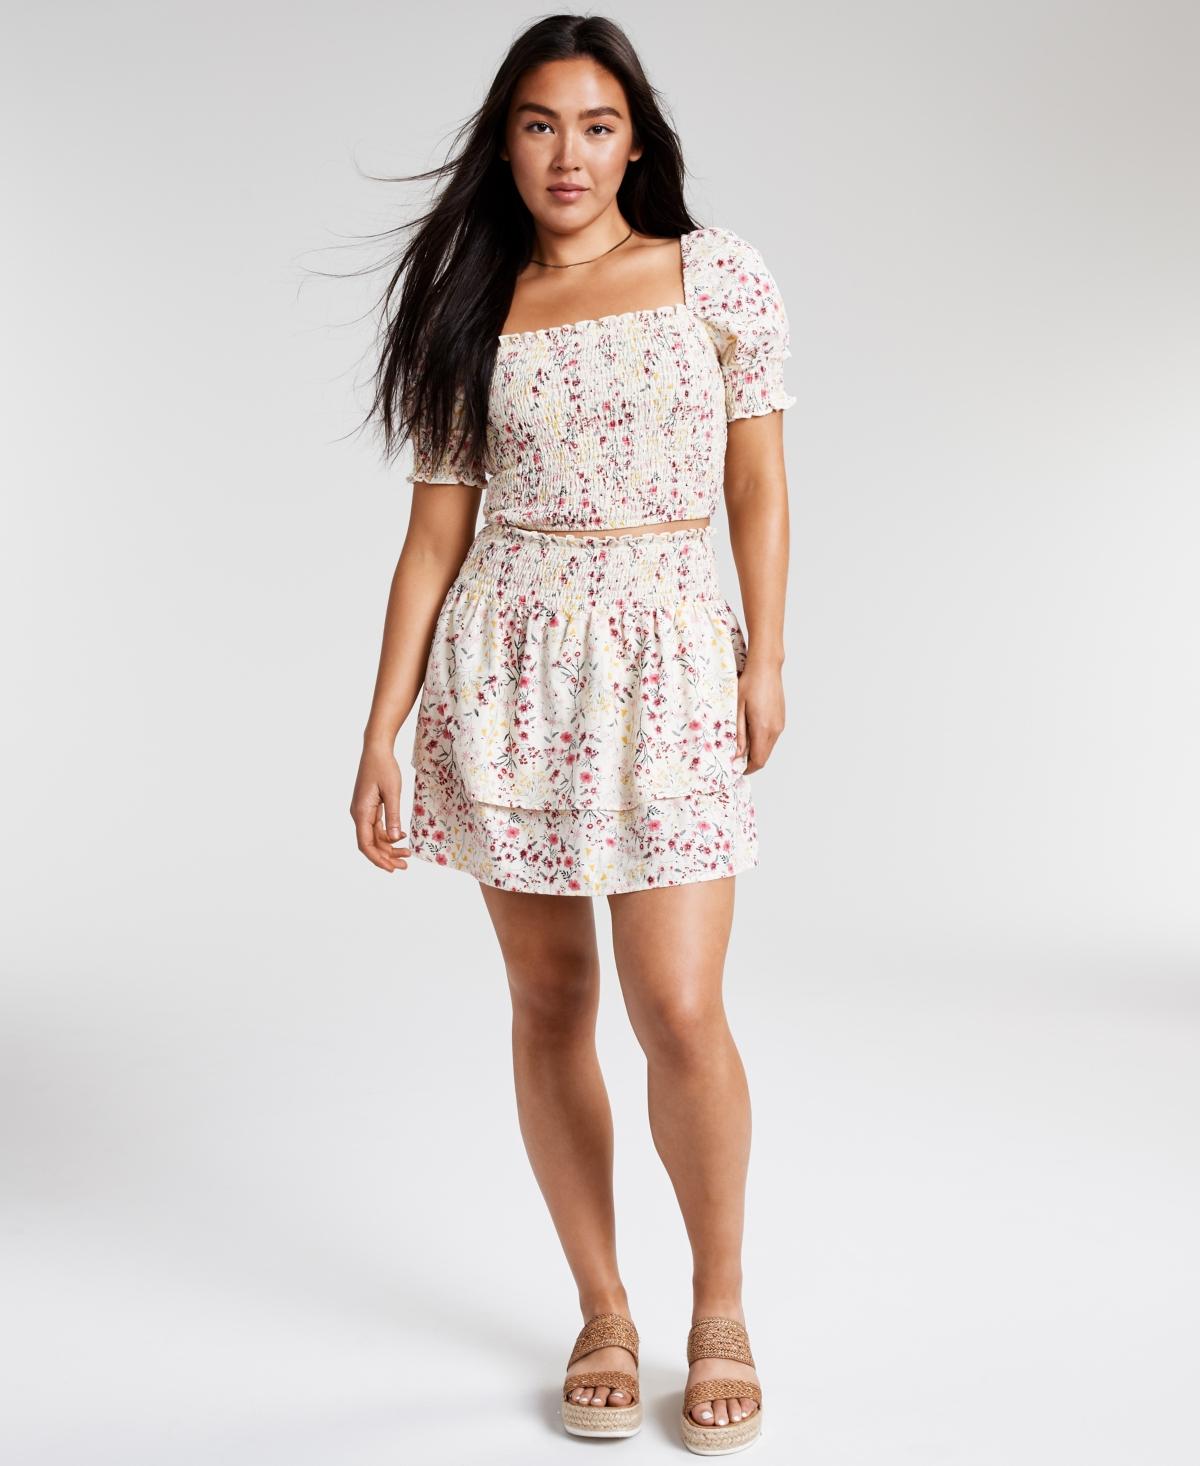 Floral-Print Smocked Skirt